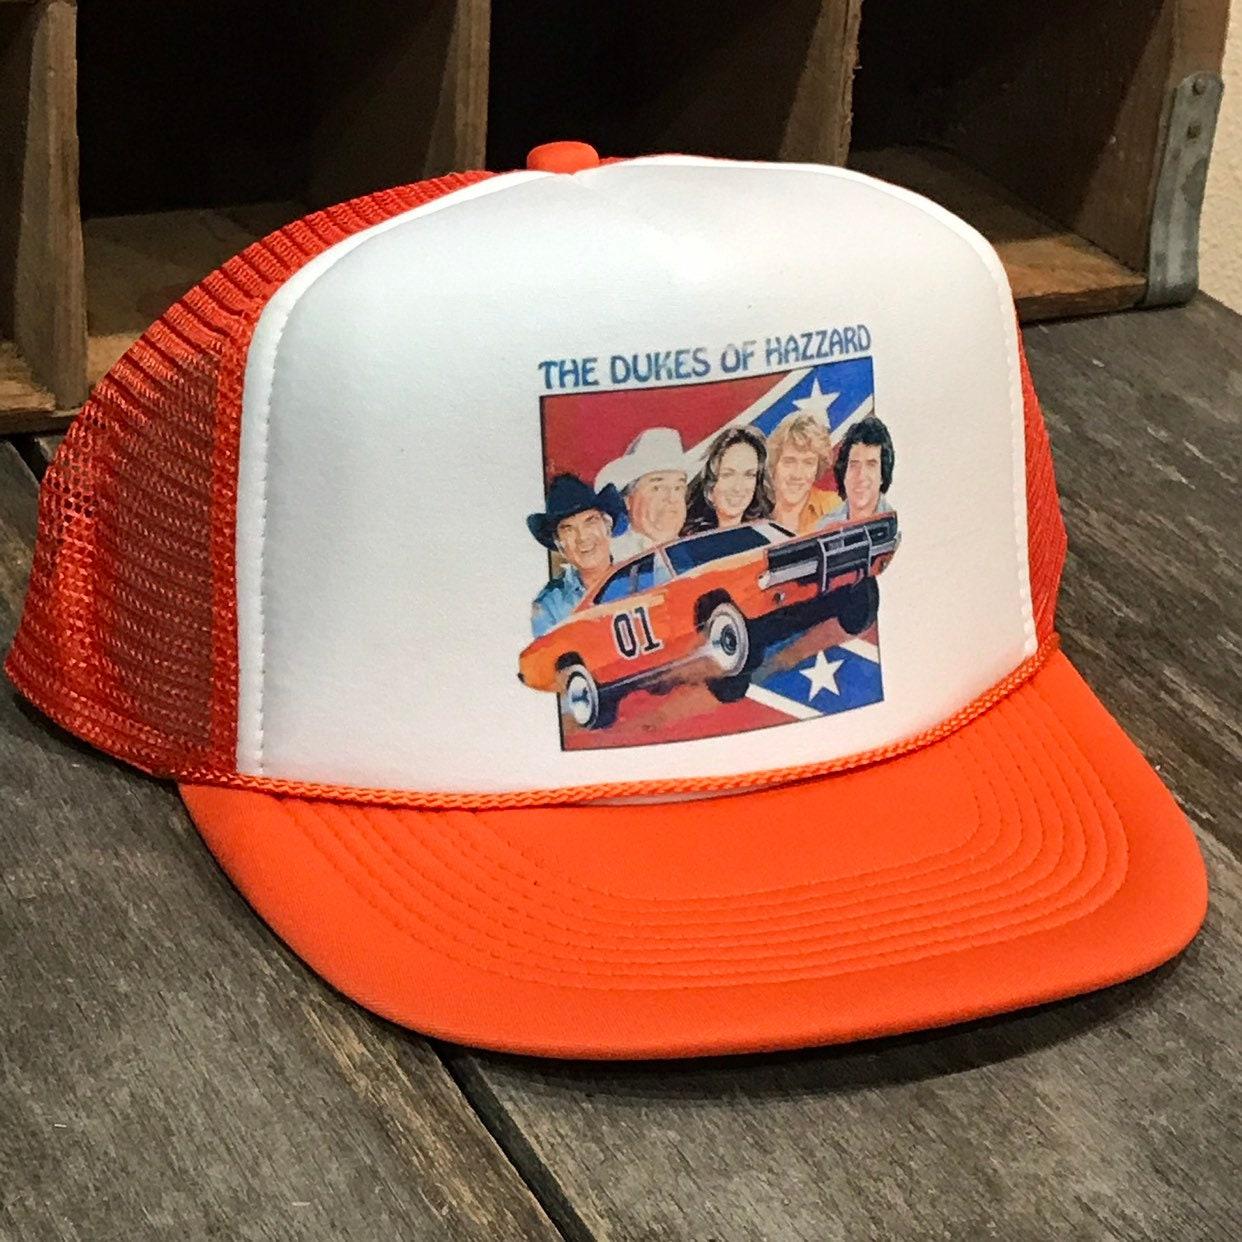 Dodge Charger Mopar Trucker Hat Vintage 70 s 80 s Mesh Cap Orange Dukes of  Hazard 0f1f7a19b20